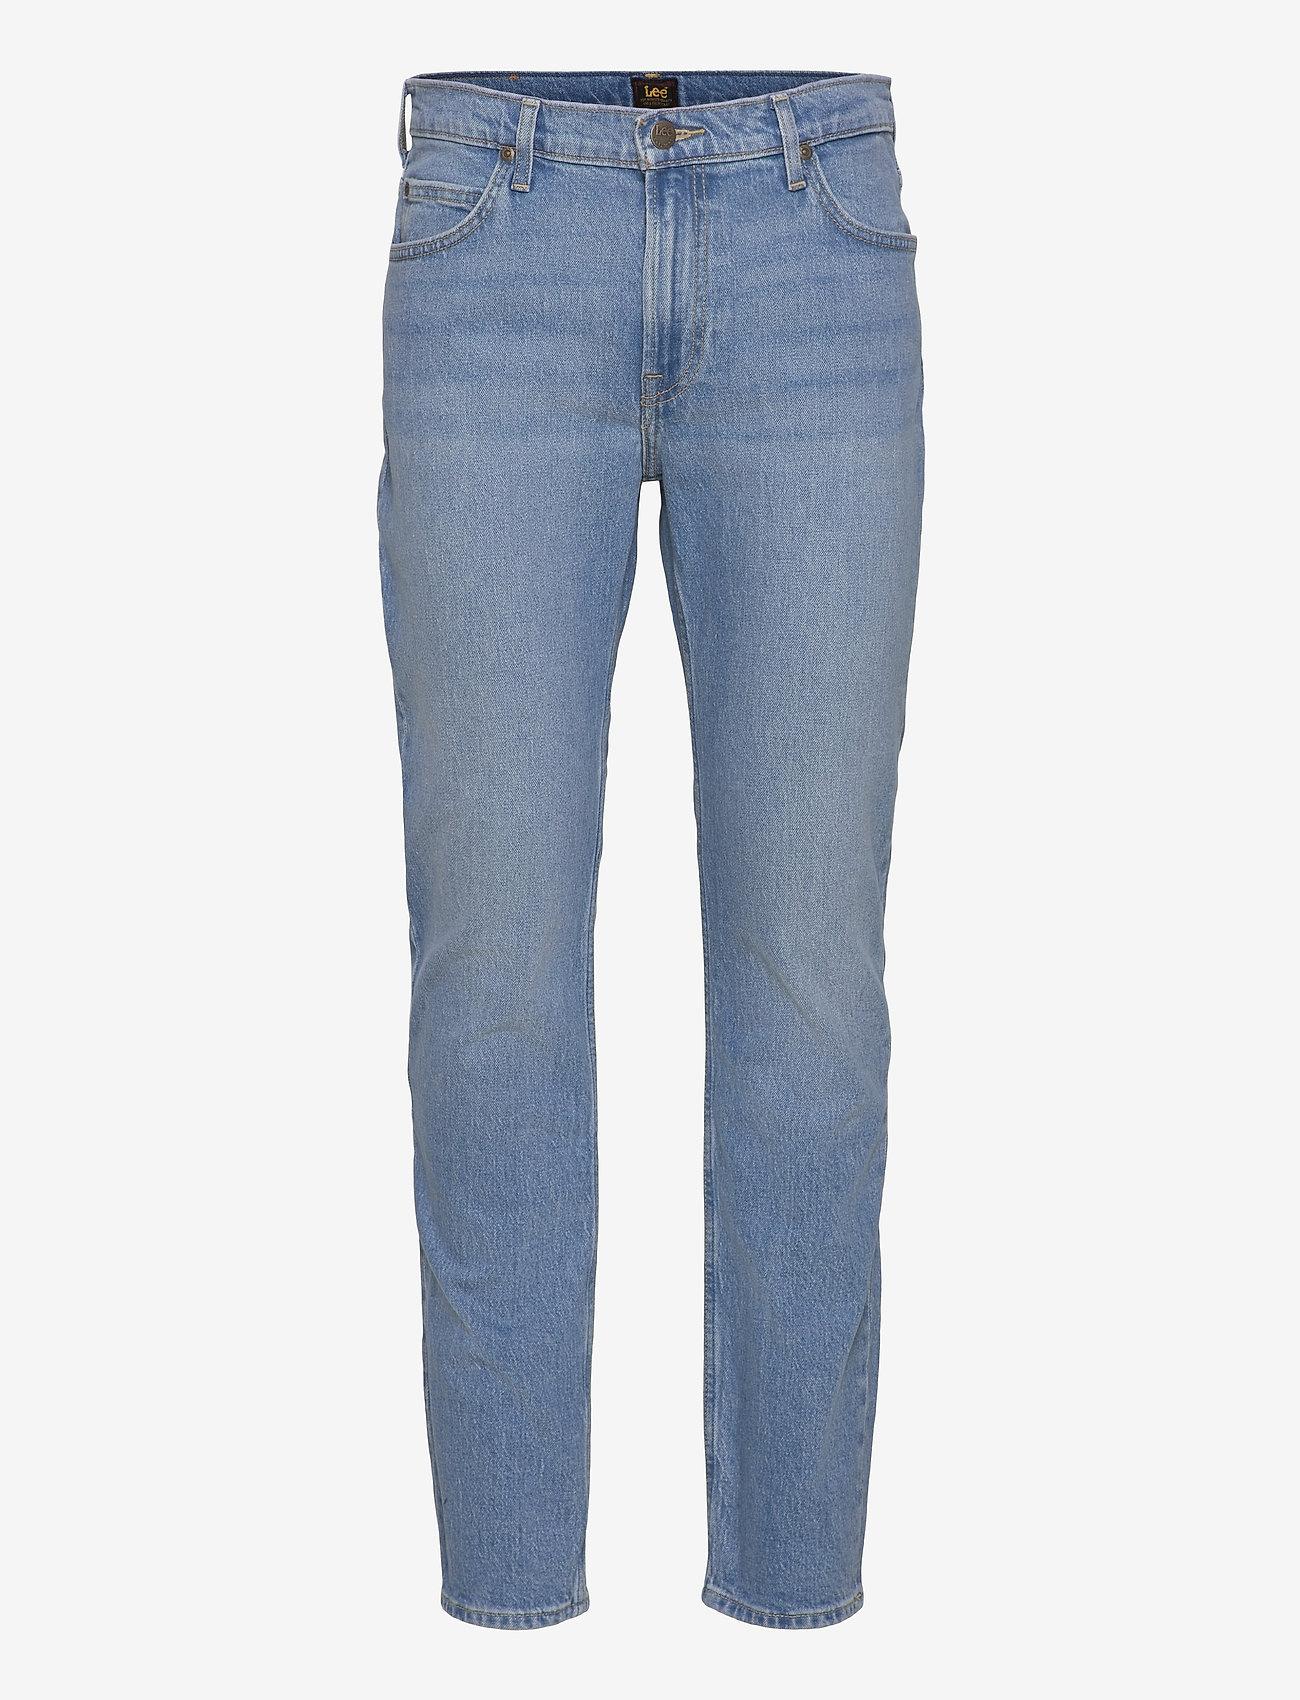 Lee Jeans - RIDER - slim jeans - mid soho - 0